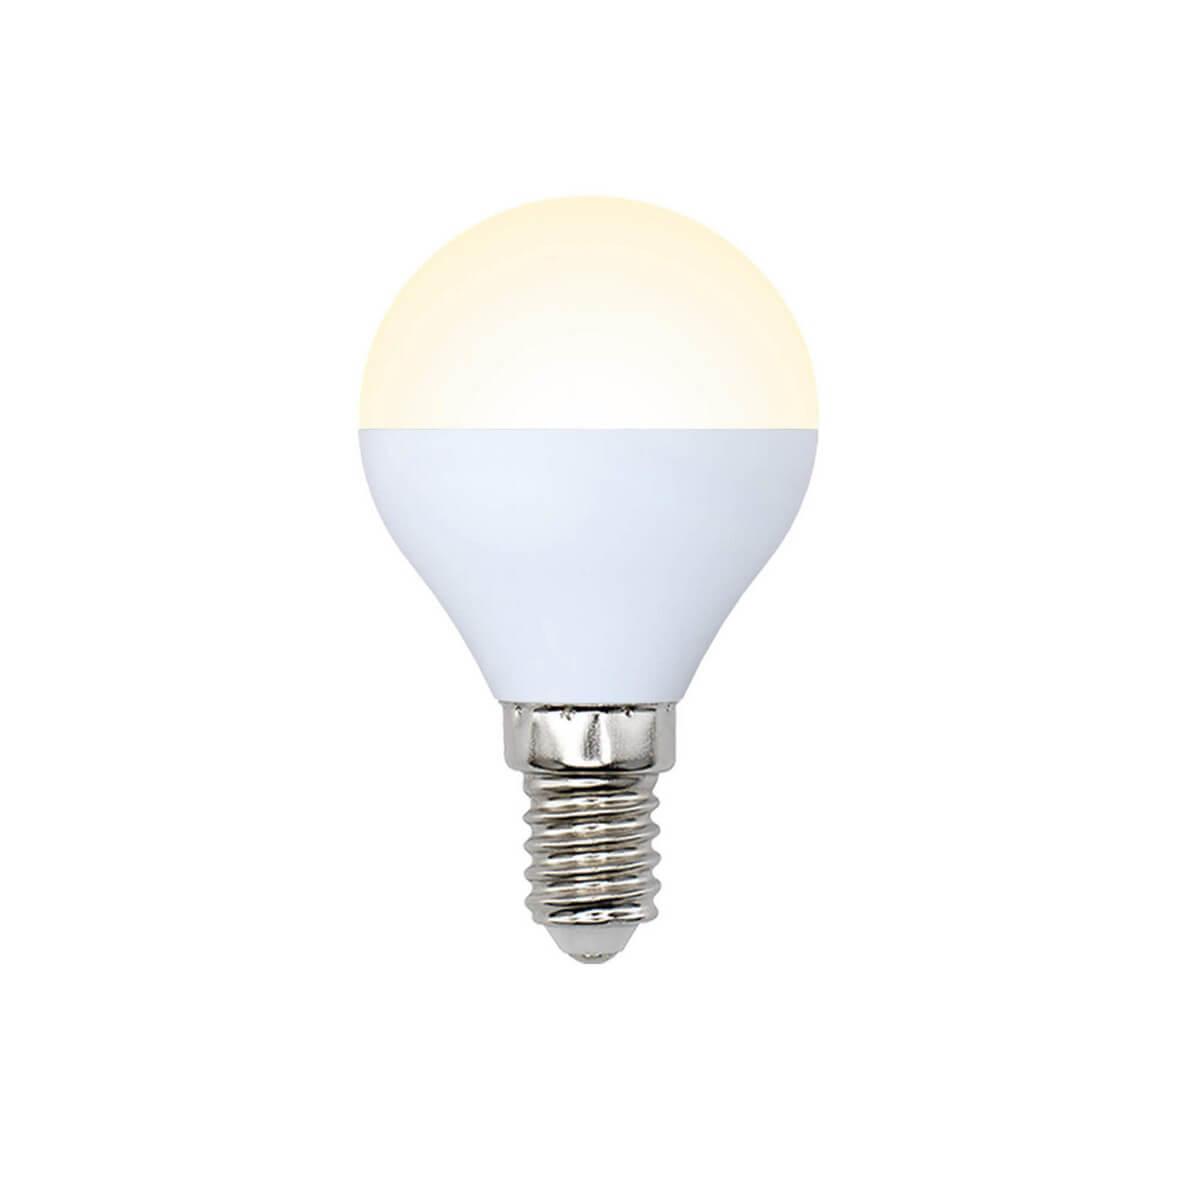 цена на Лампа светодиодная (10217) E14 6W 3000K матовая LED-G45-6W/WW/E14/FR/O